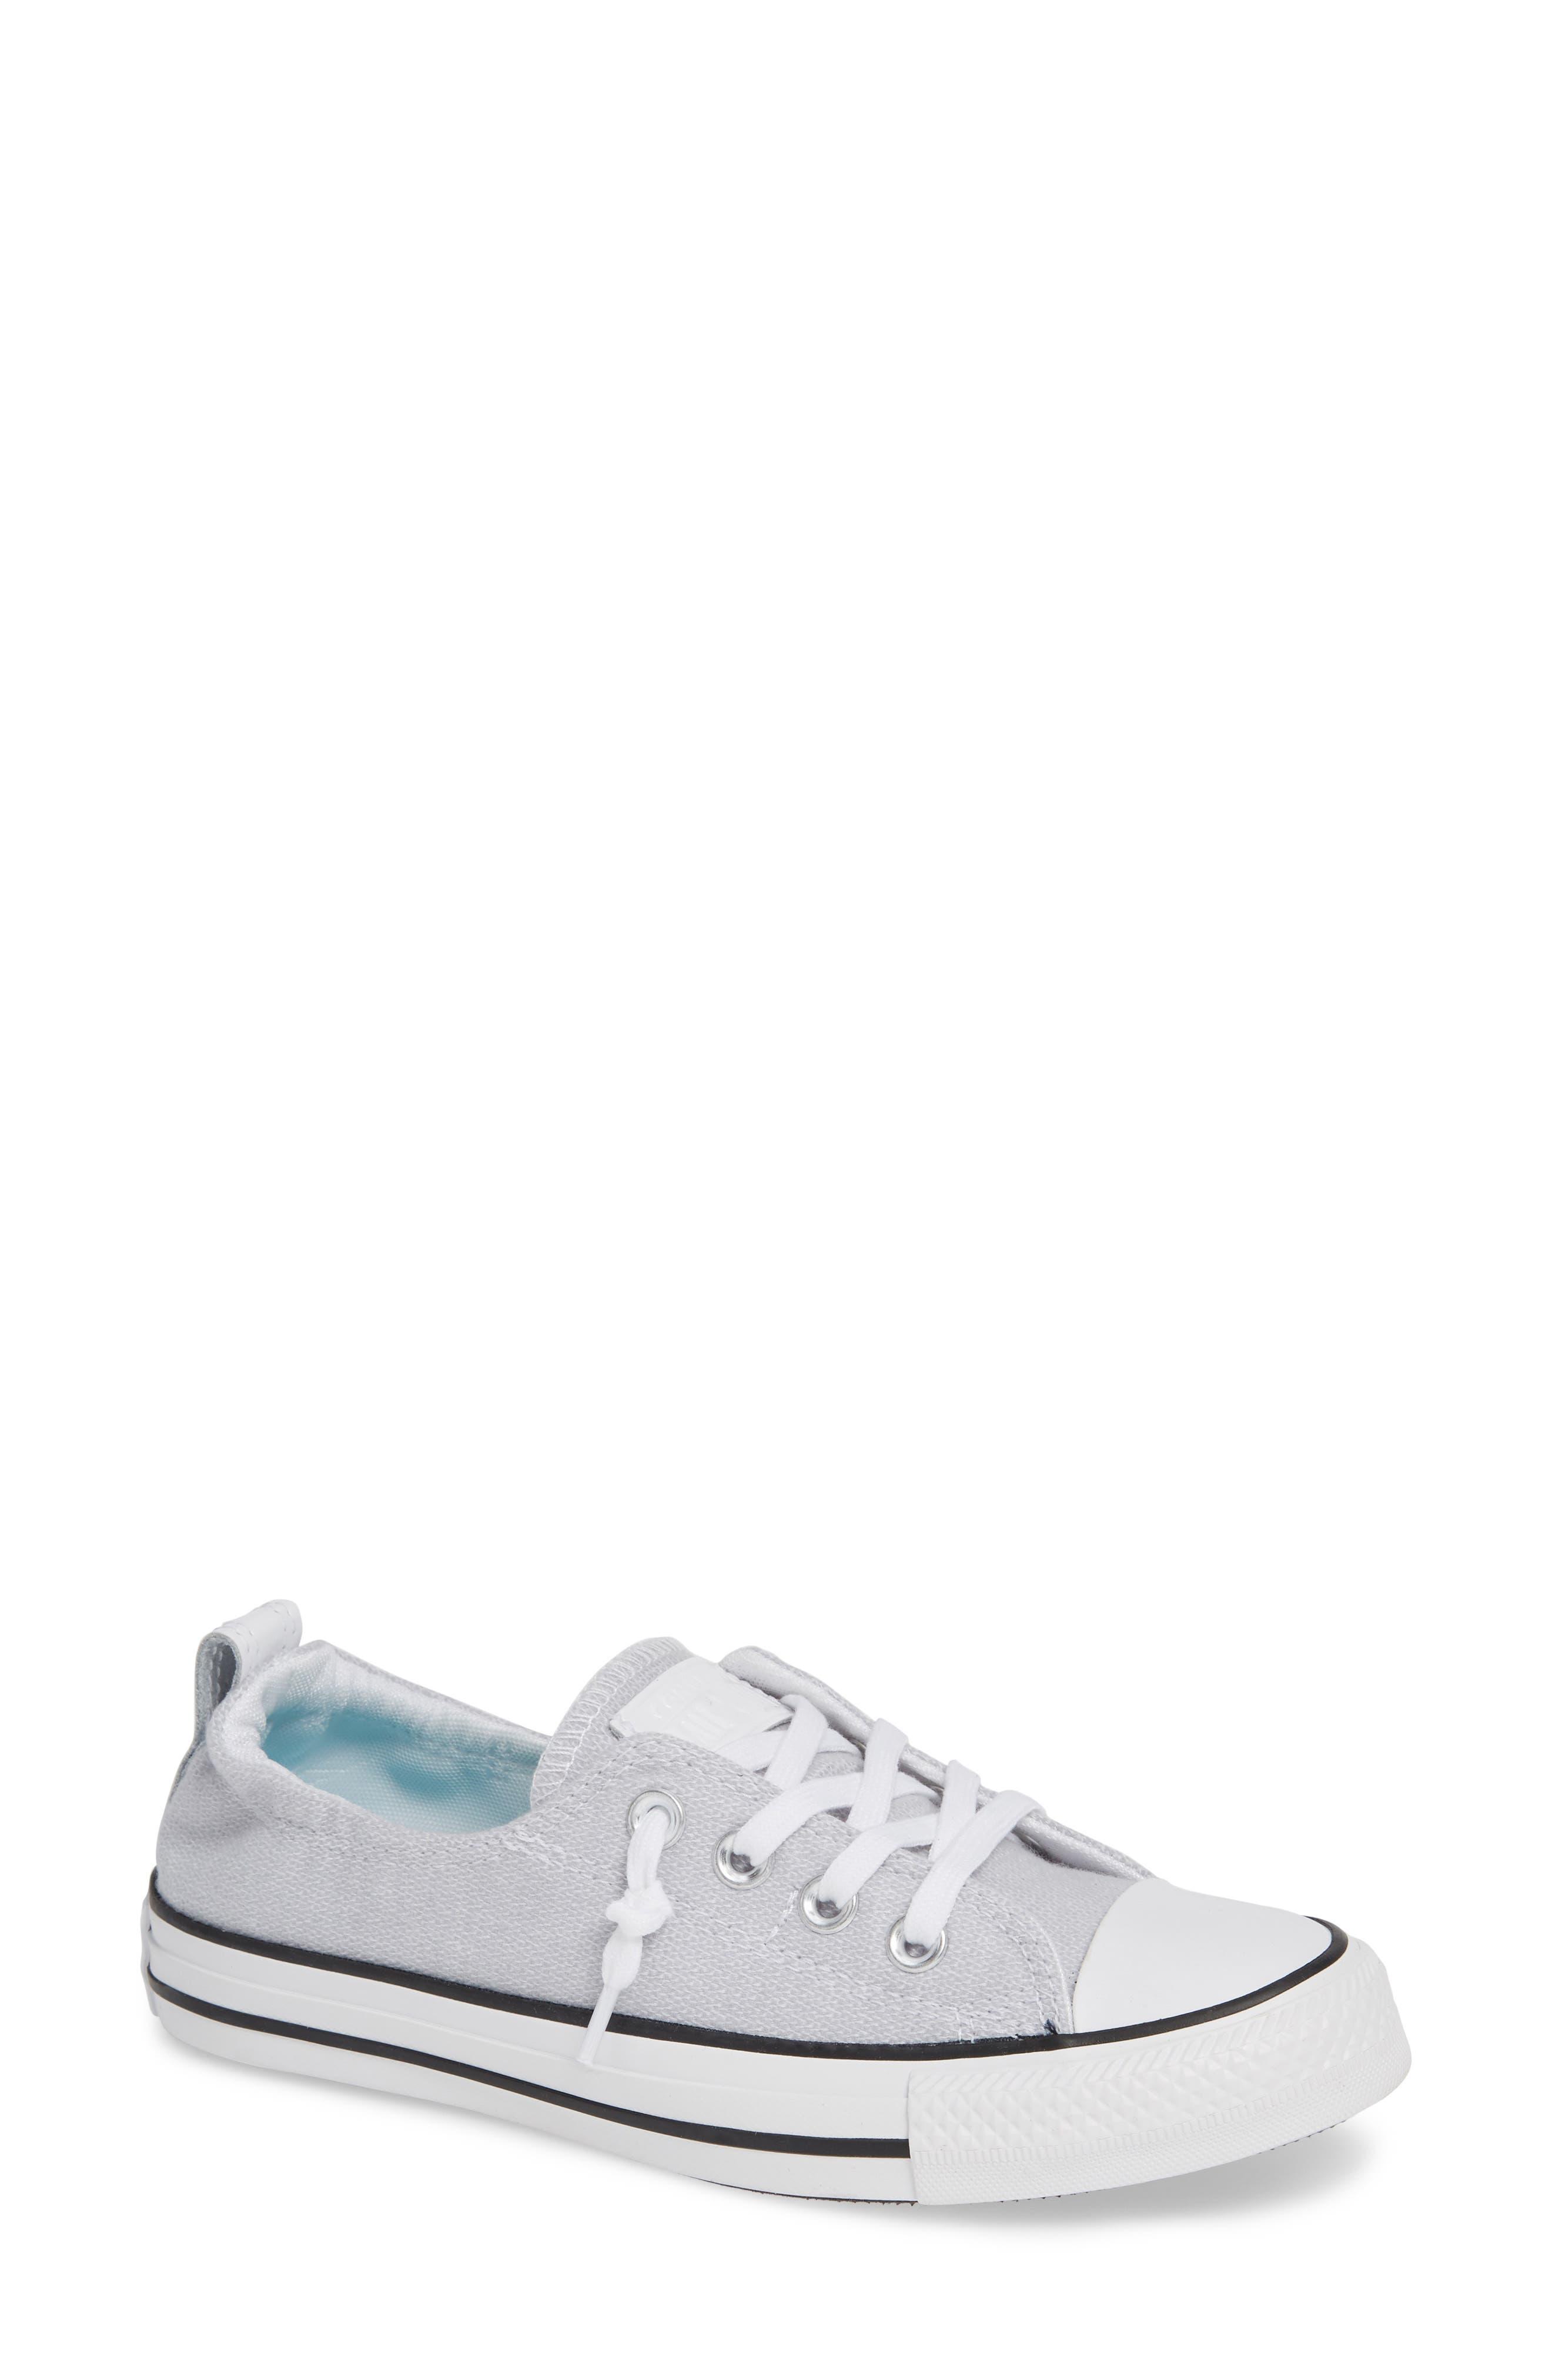 CONVERSE, Chuck Taylor<sup>®</sup> 'Shoreline' Sneaker, Main thumbnail 1, color, WHITE